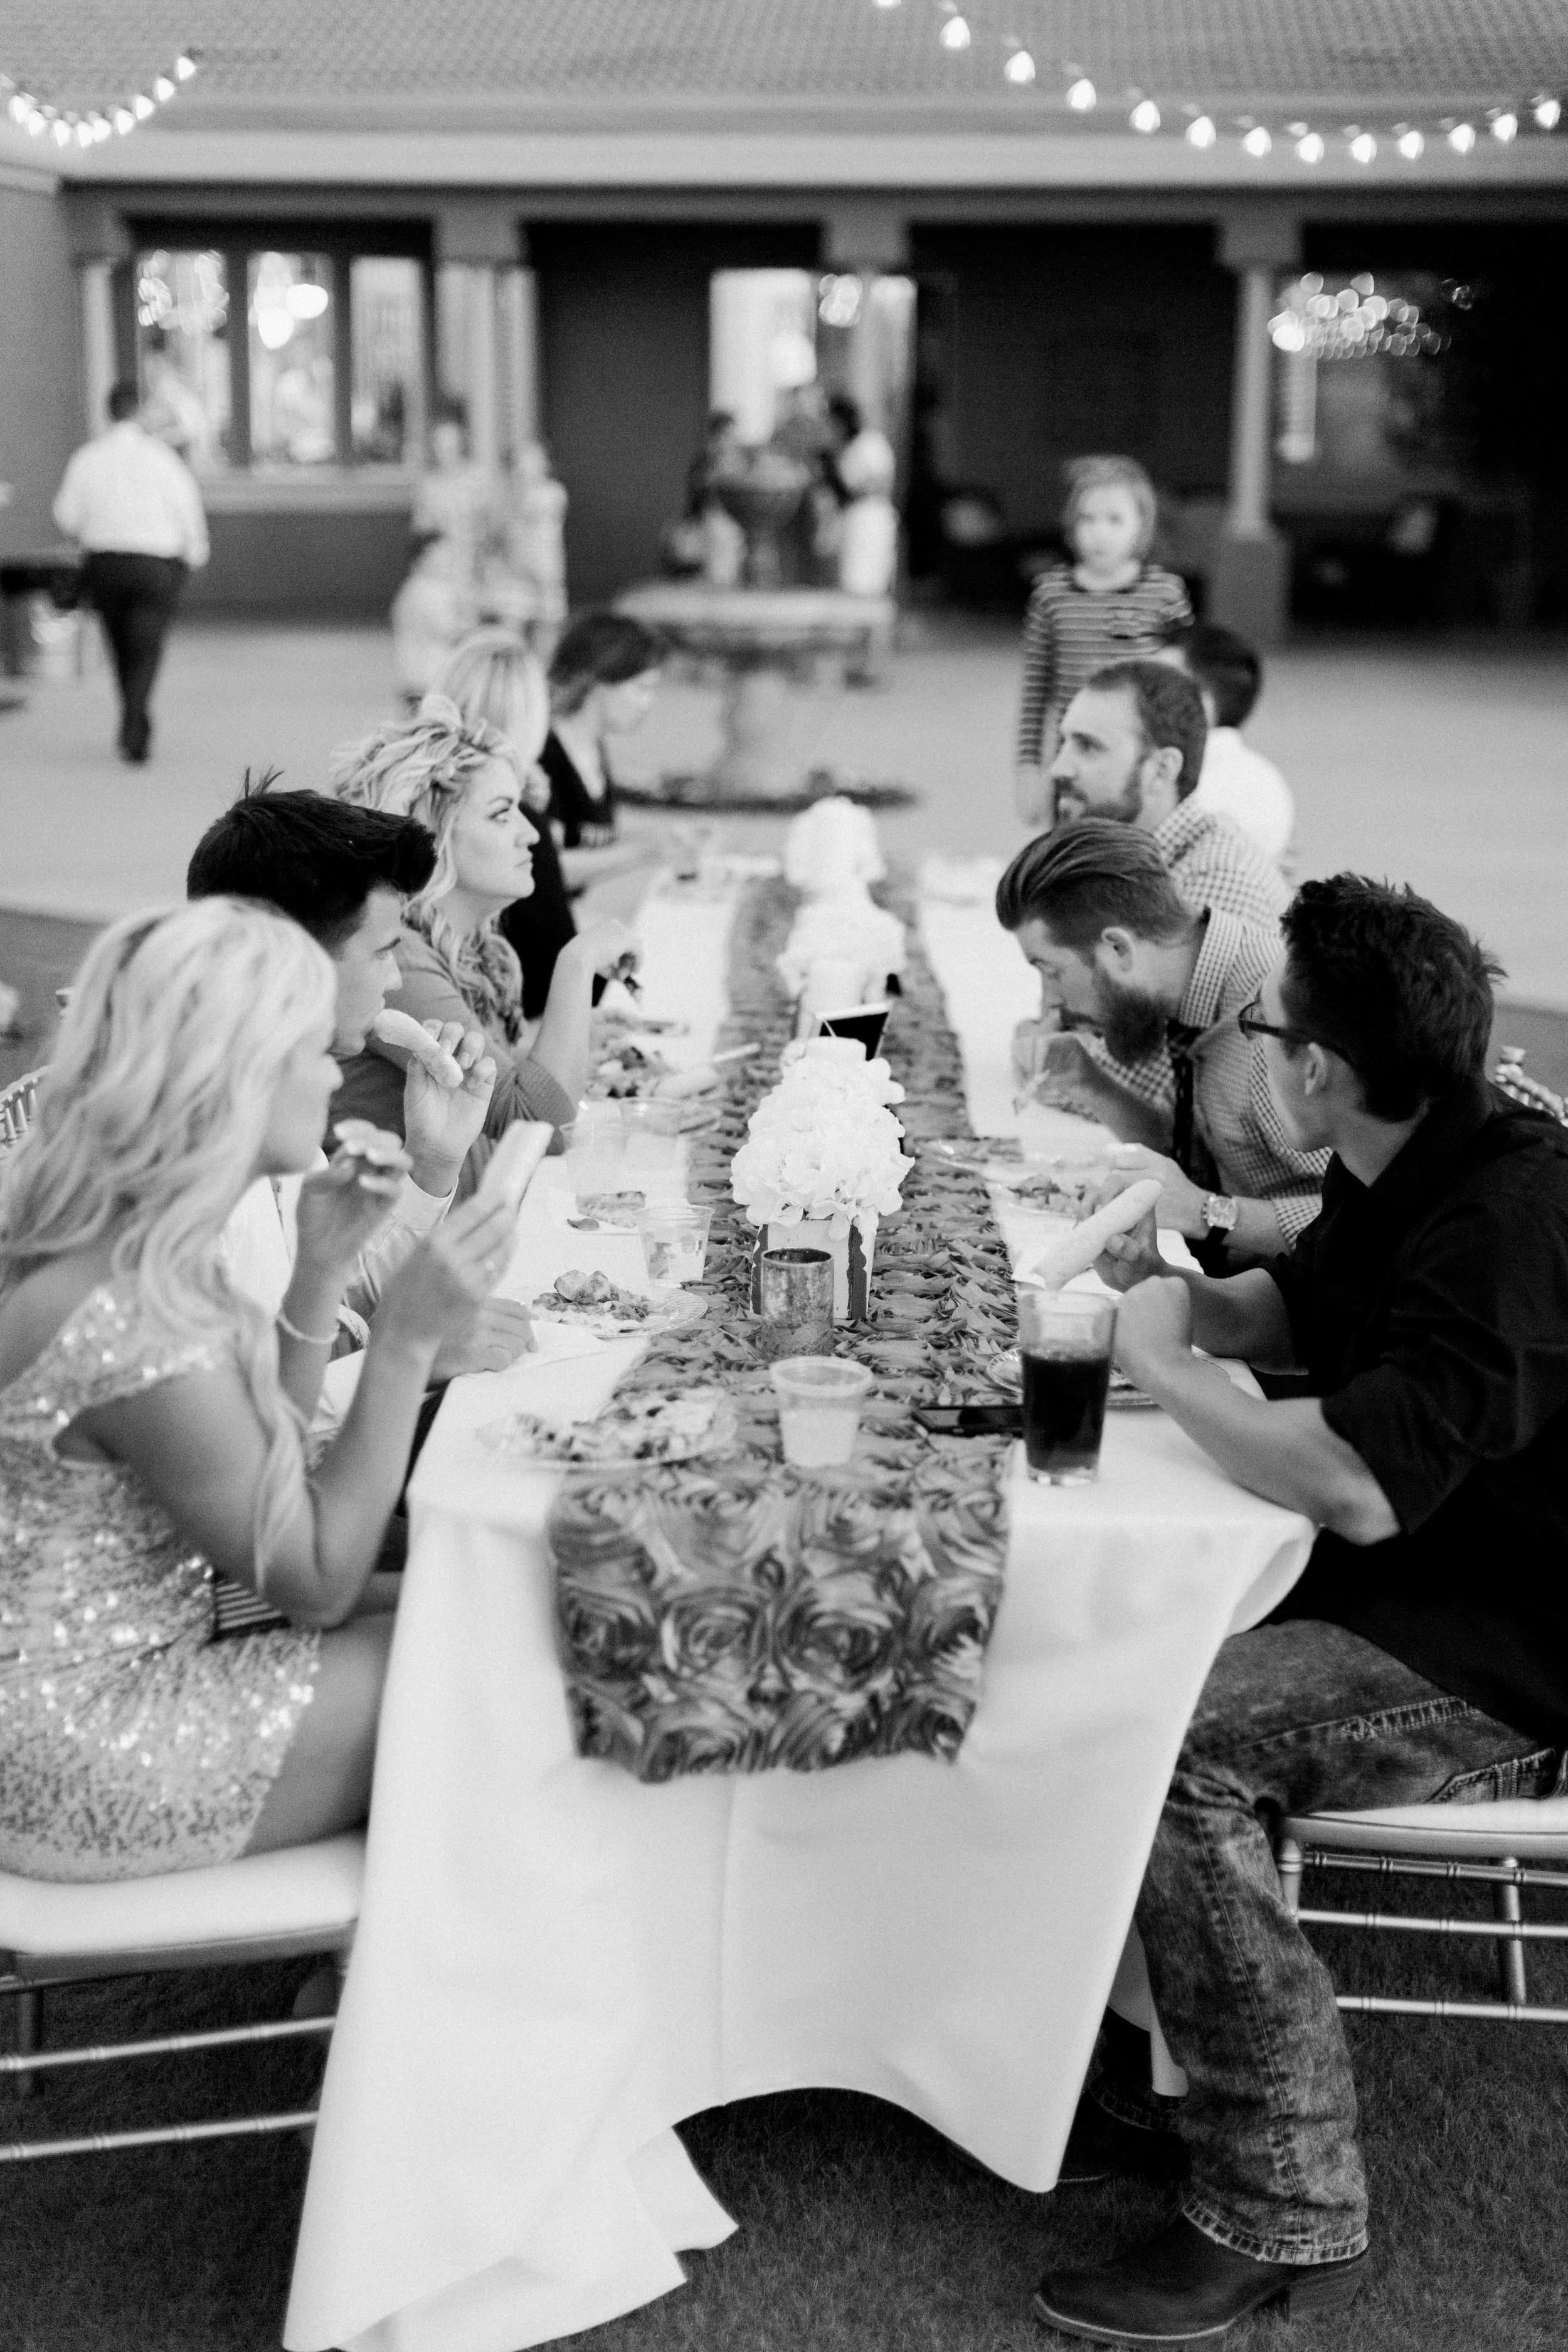 KennedyWyatt_WeddingDay-188.jpg